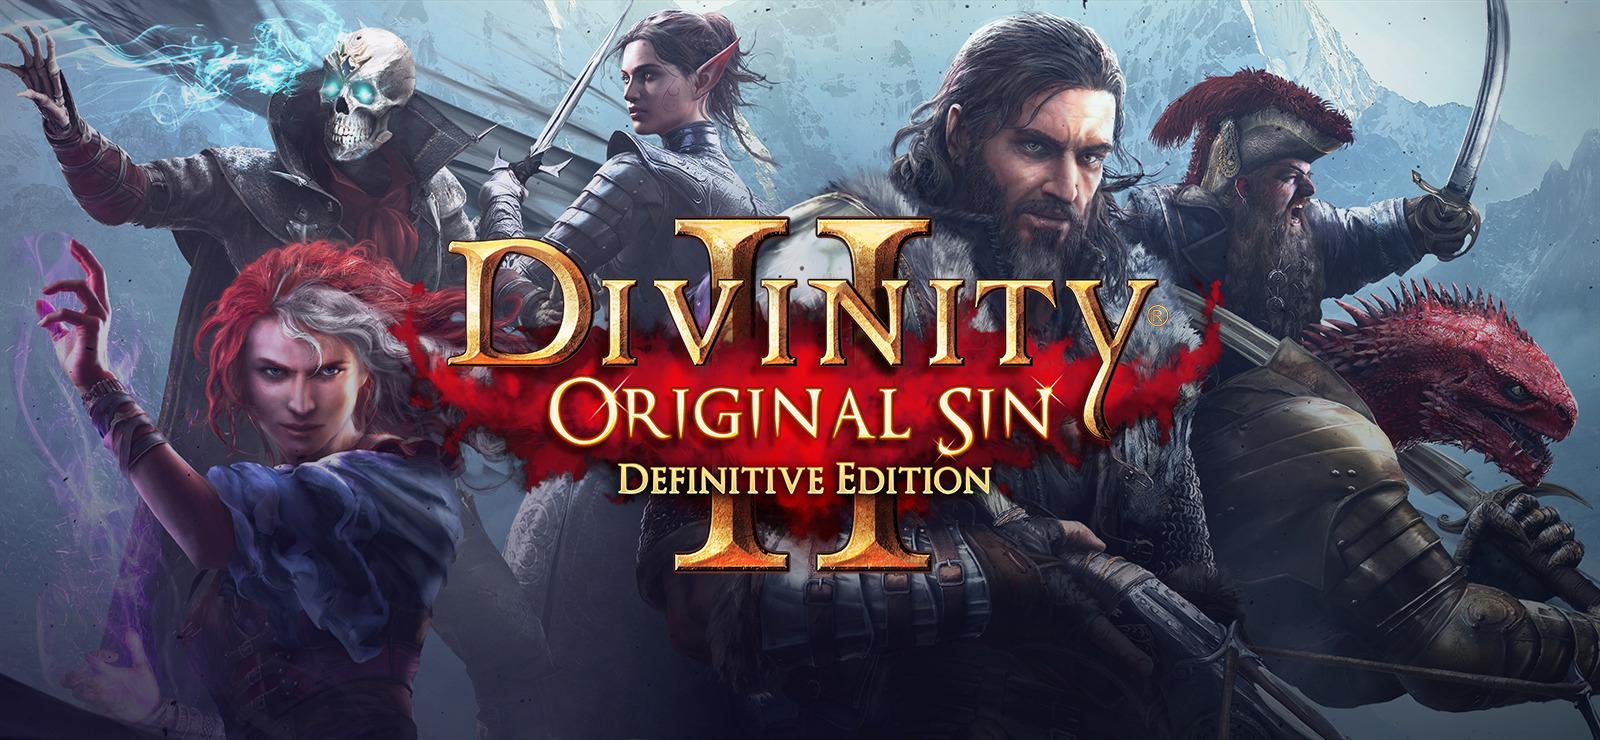 [PC] Divinity: Original Sin 2 - Definitive Edition (DRM-Free, VPN)